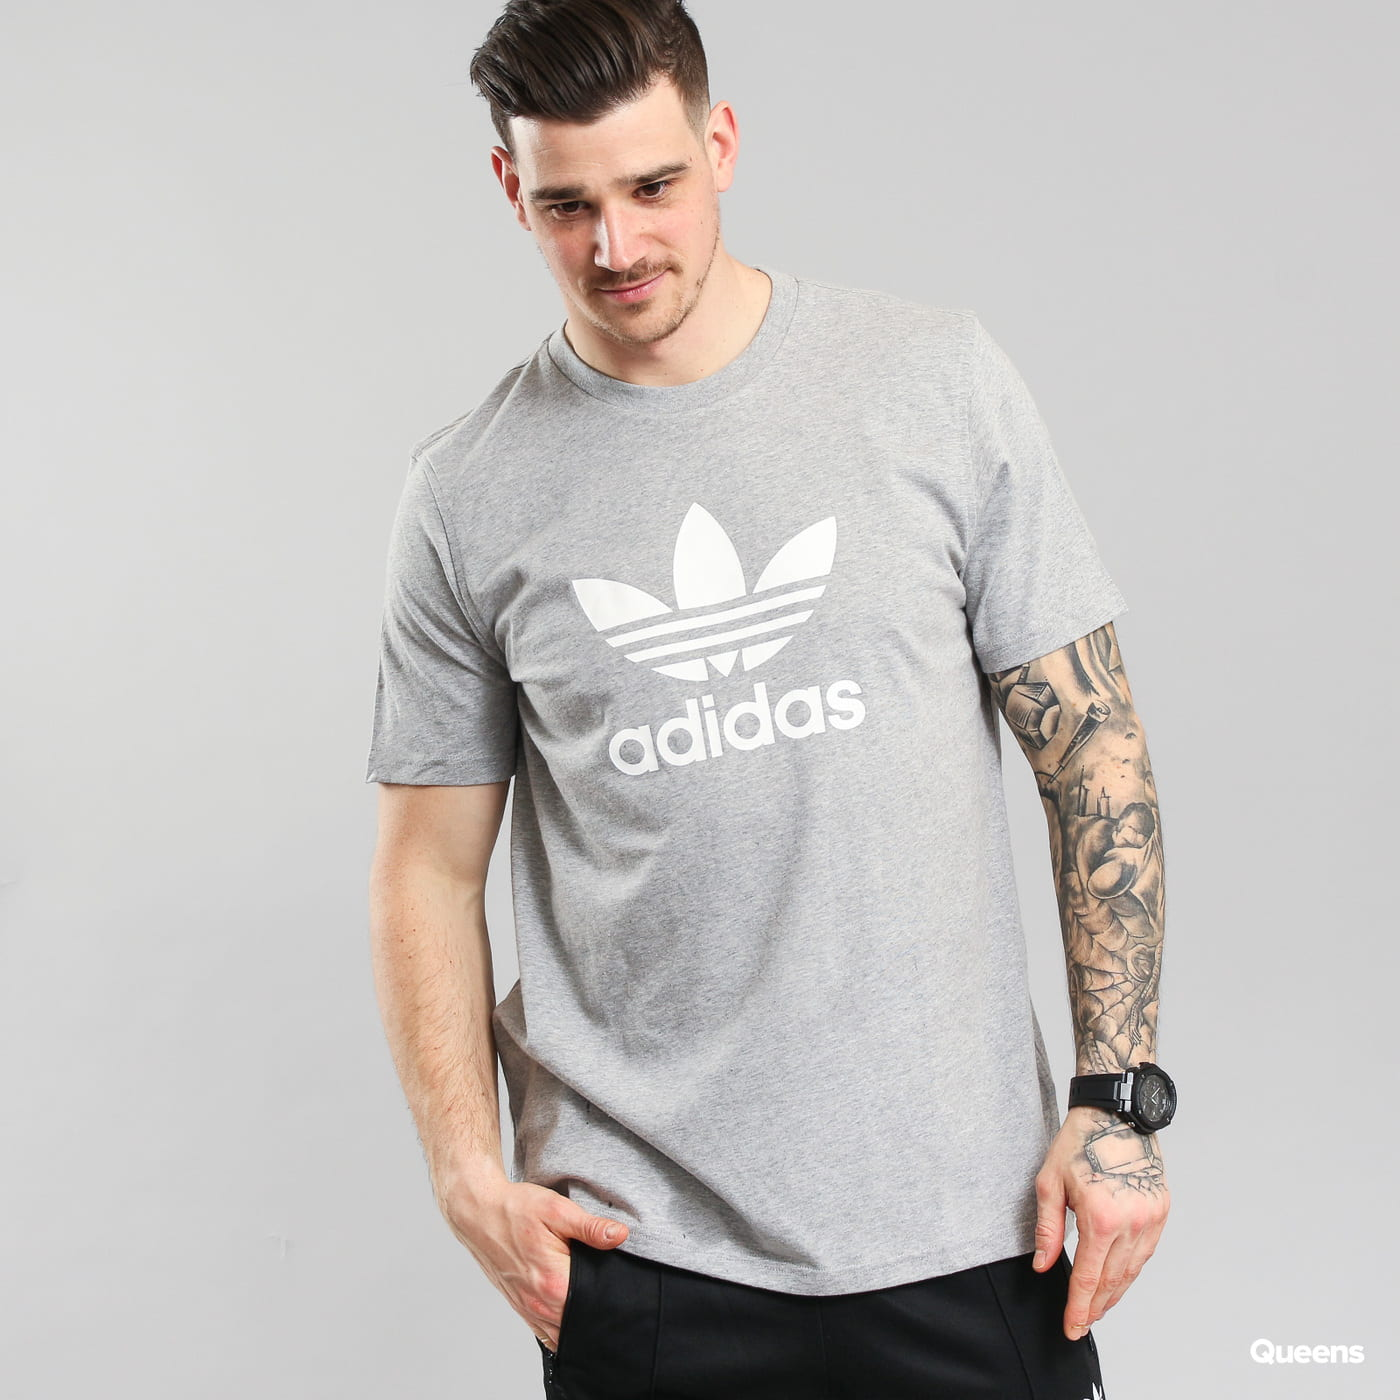 adidas Originals Trefoil T-shirt melange gray